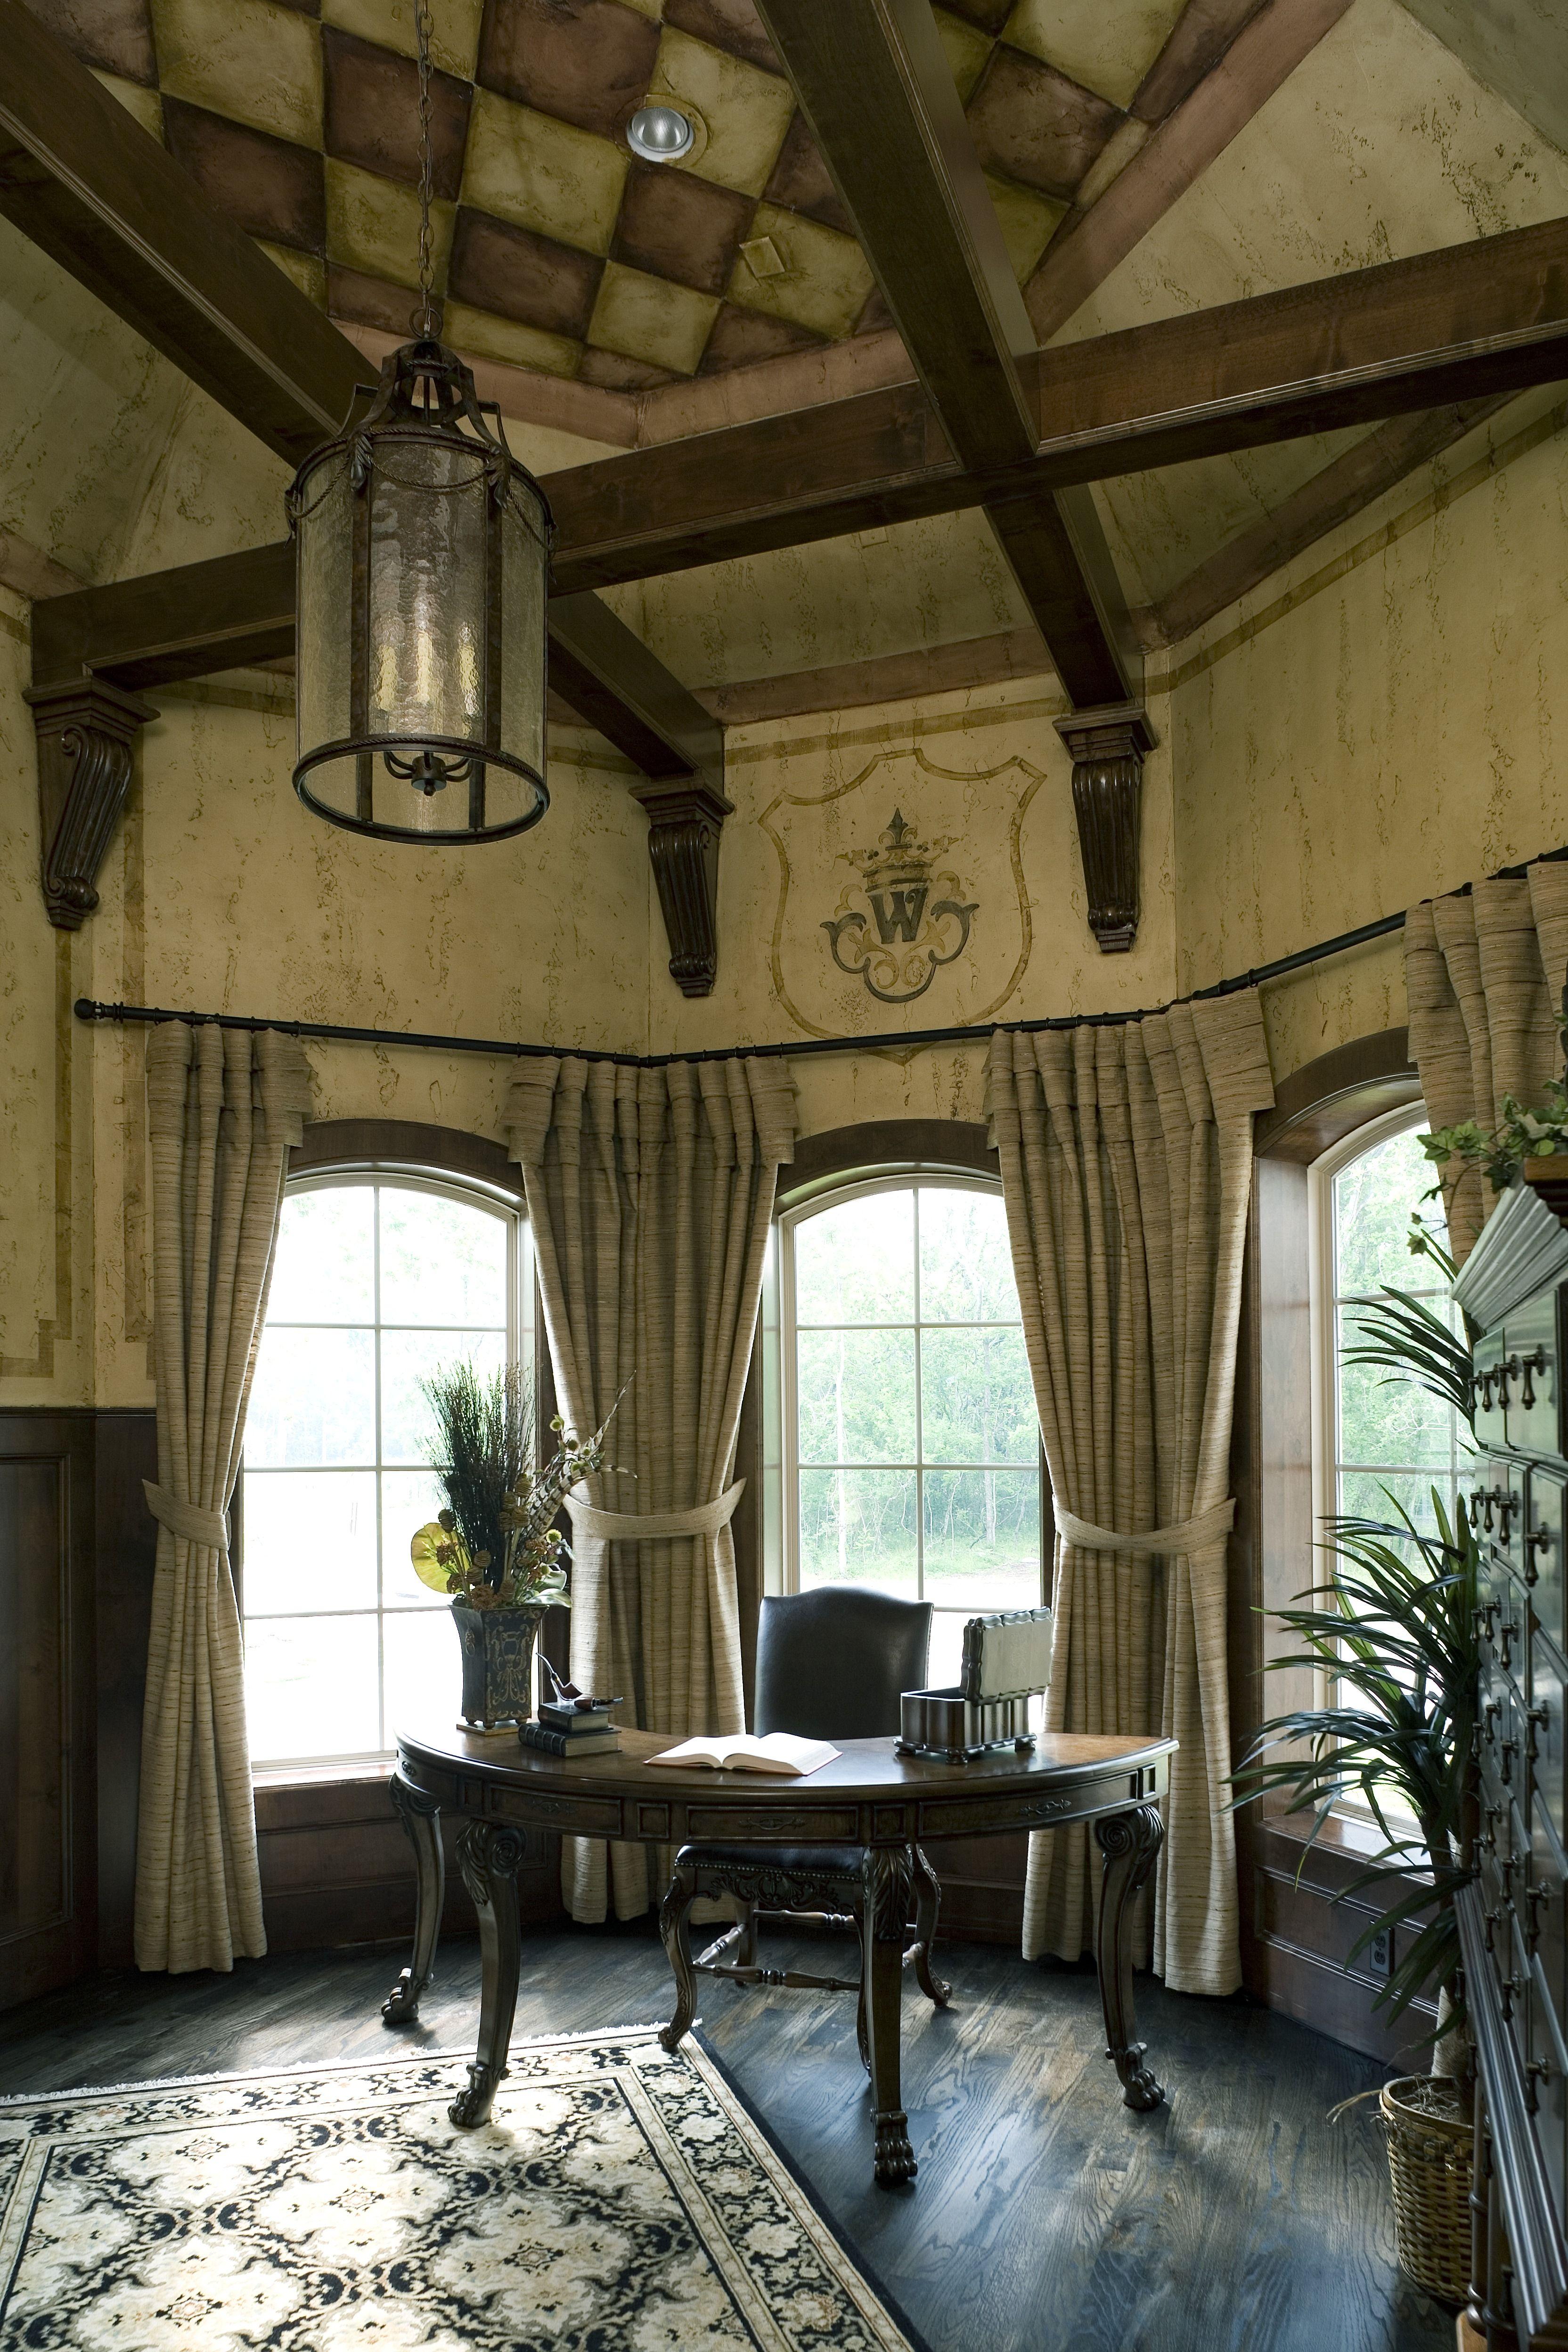 Interior Design Costs Cost of wood flooring, Wood